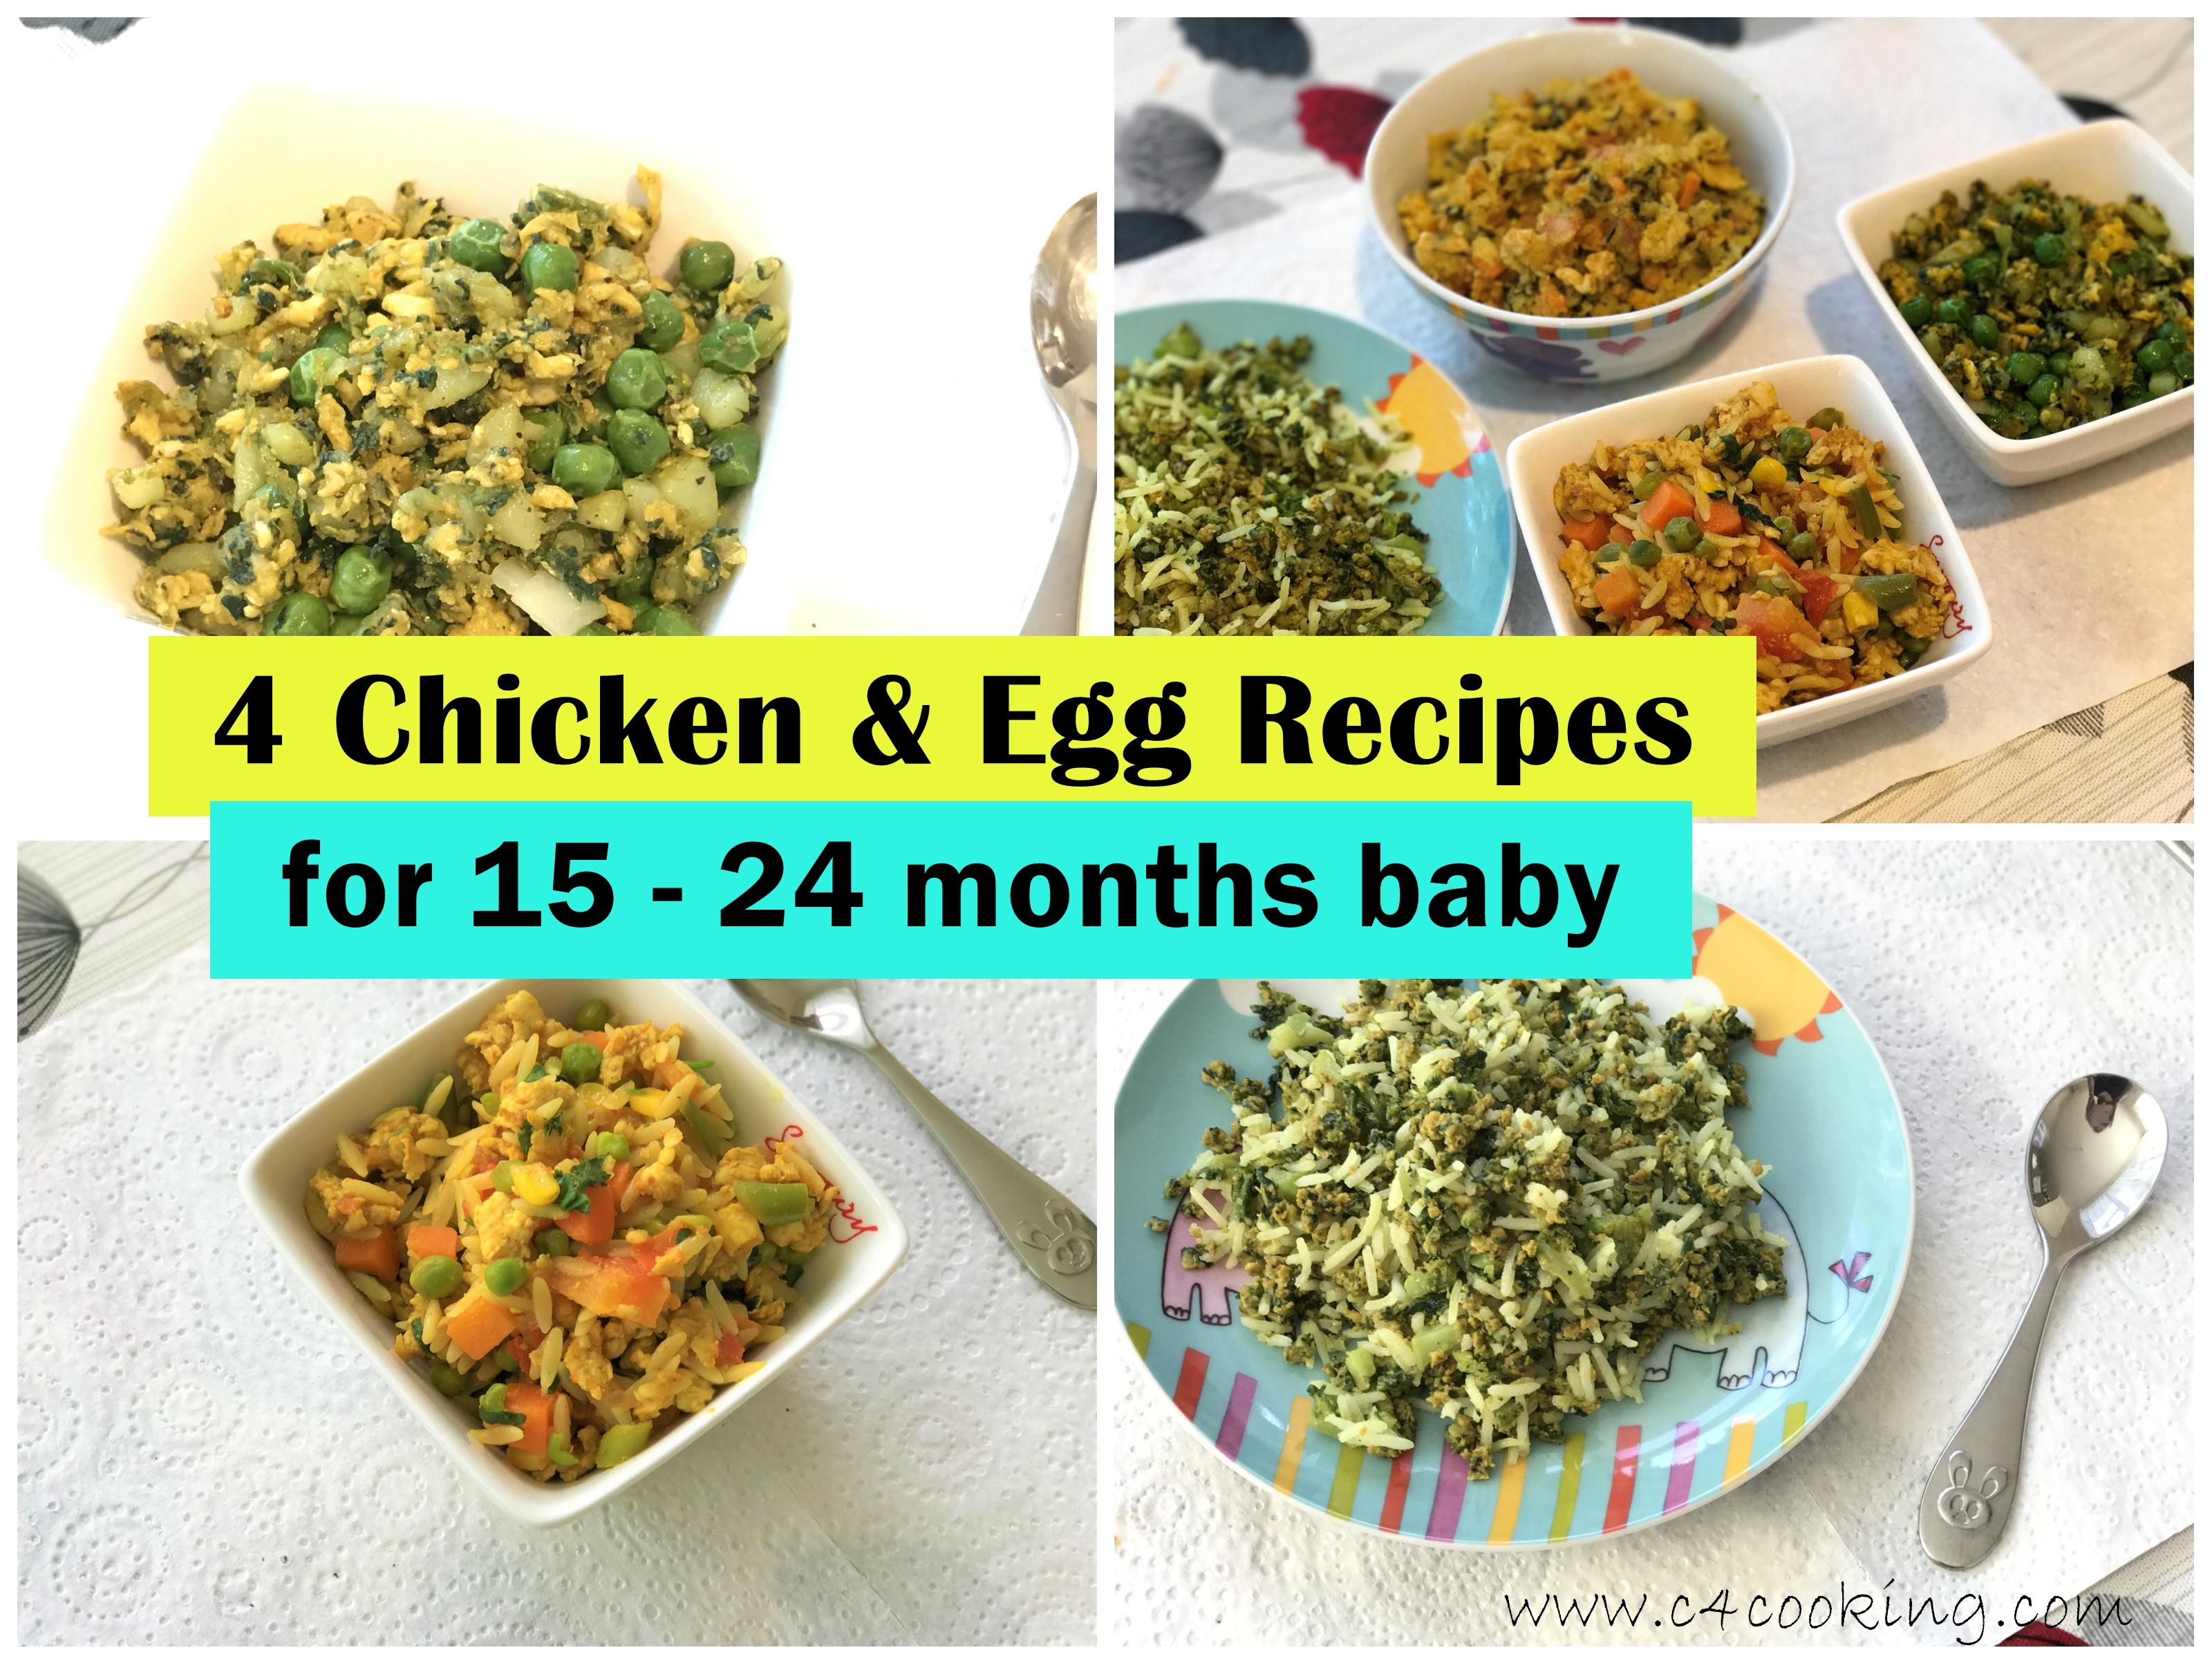 chicken egg recipes for toddler, indian toddler recipe, Toddler recipes